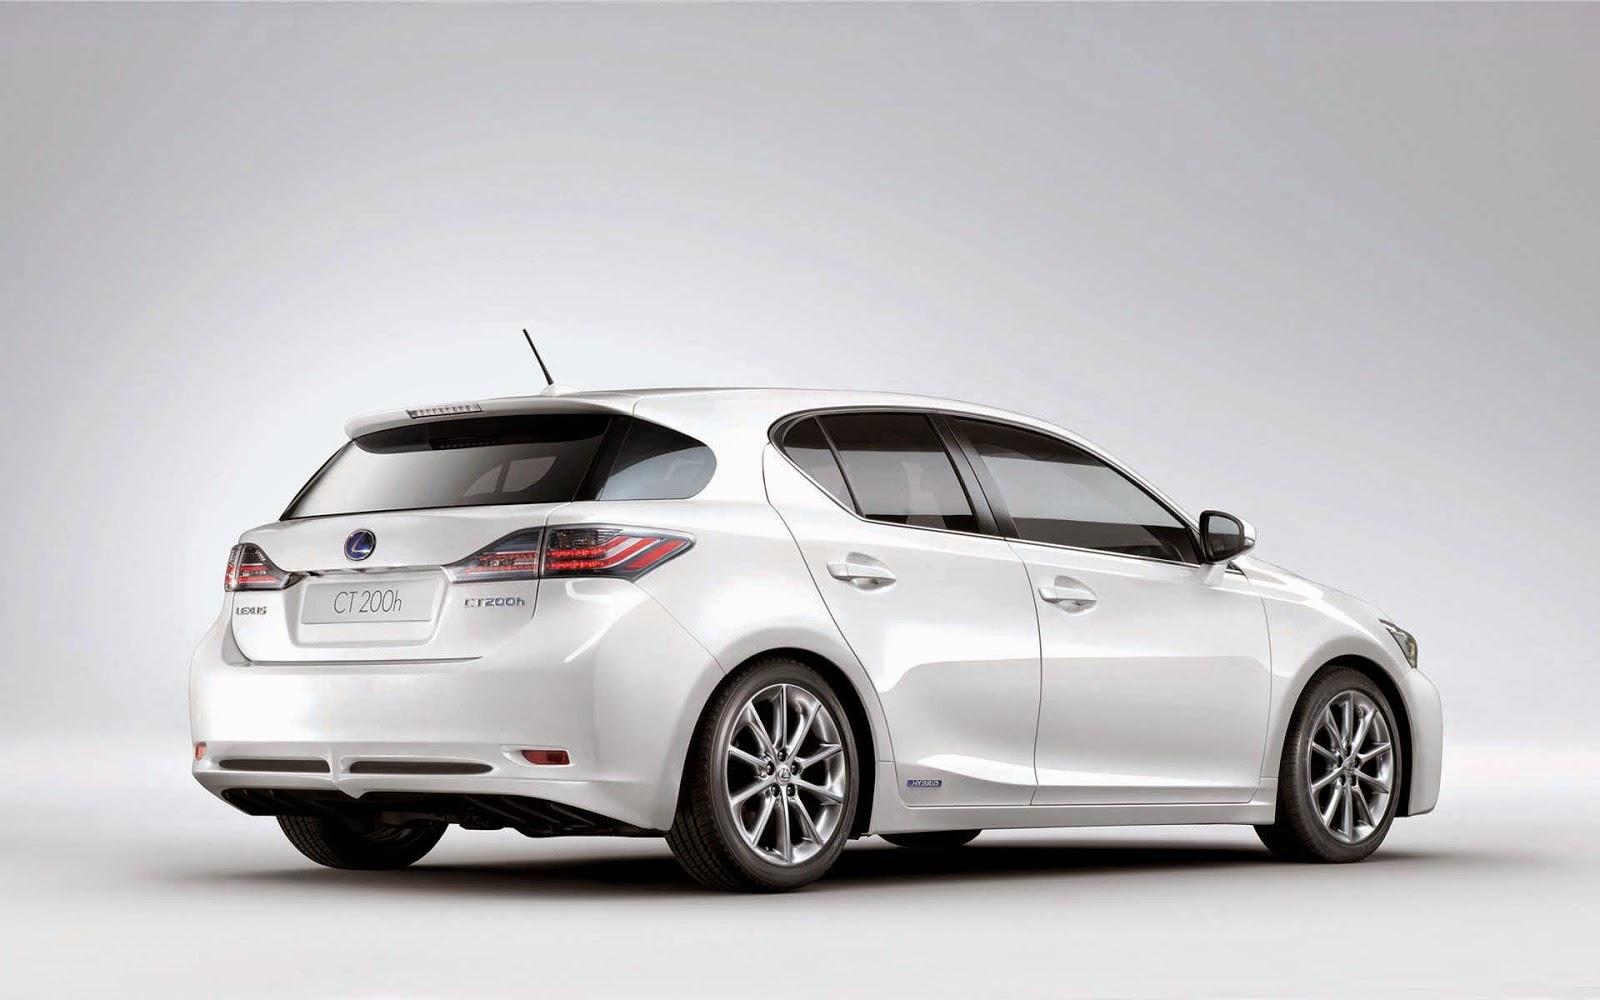 http://www.autocarsinfo.com/2014/08/2011-lexus-ct-200h-2-free-wallpaper.html